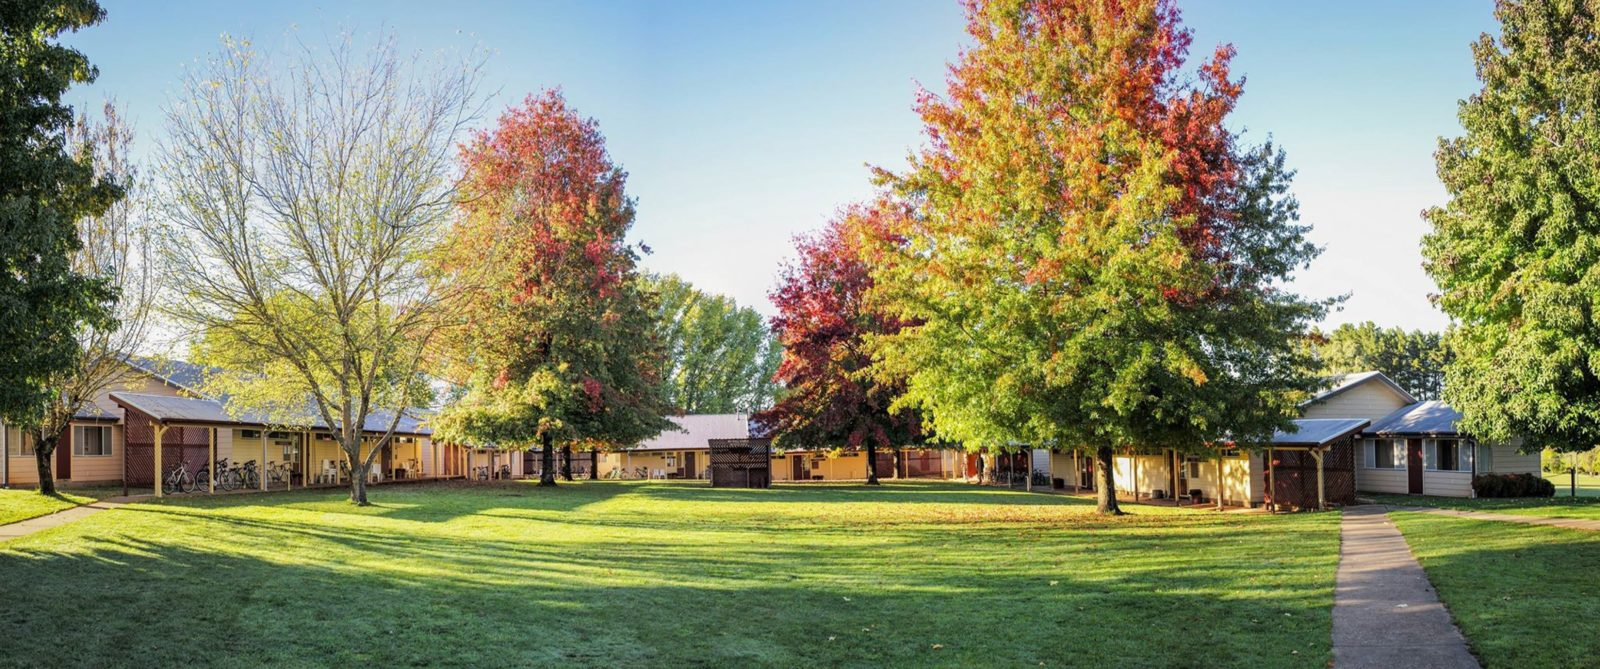 Laurel Hill Forest Lodge